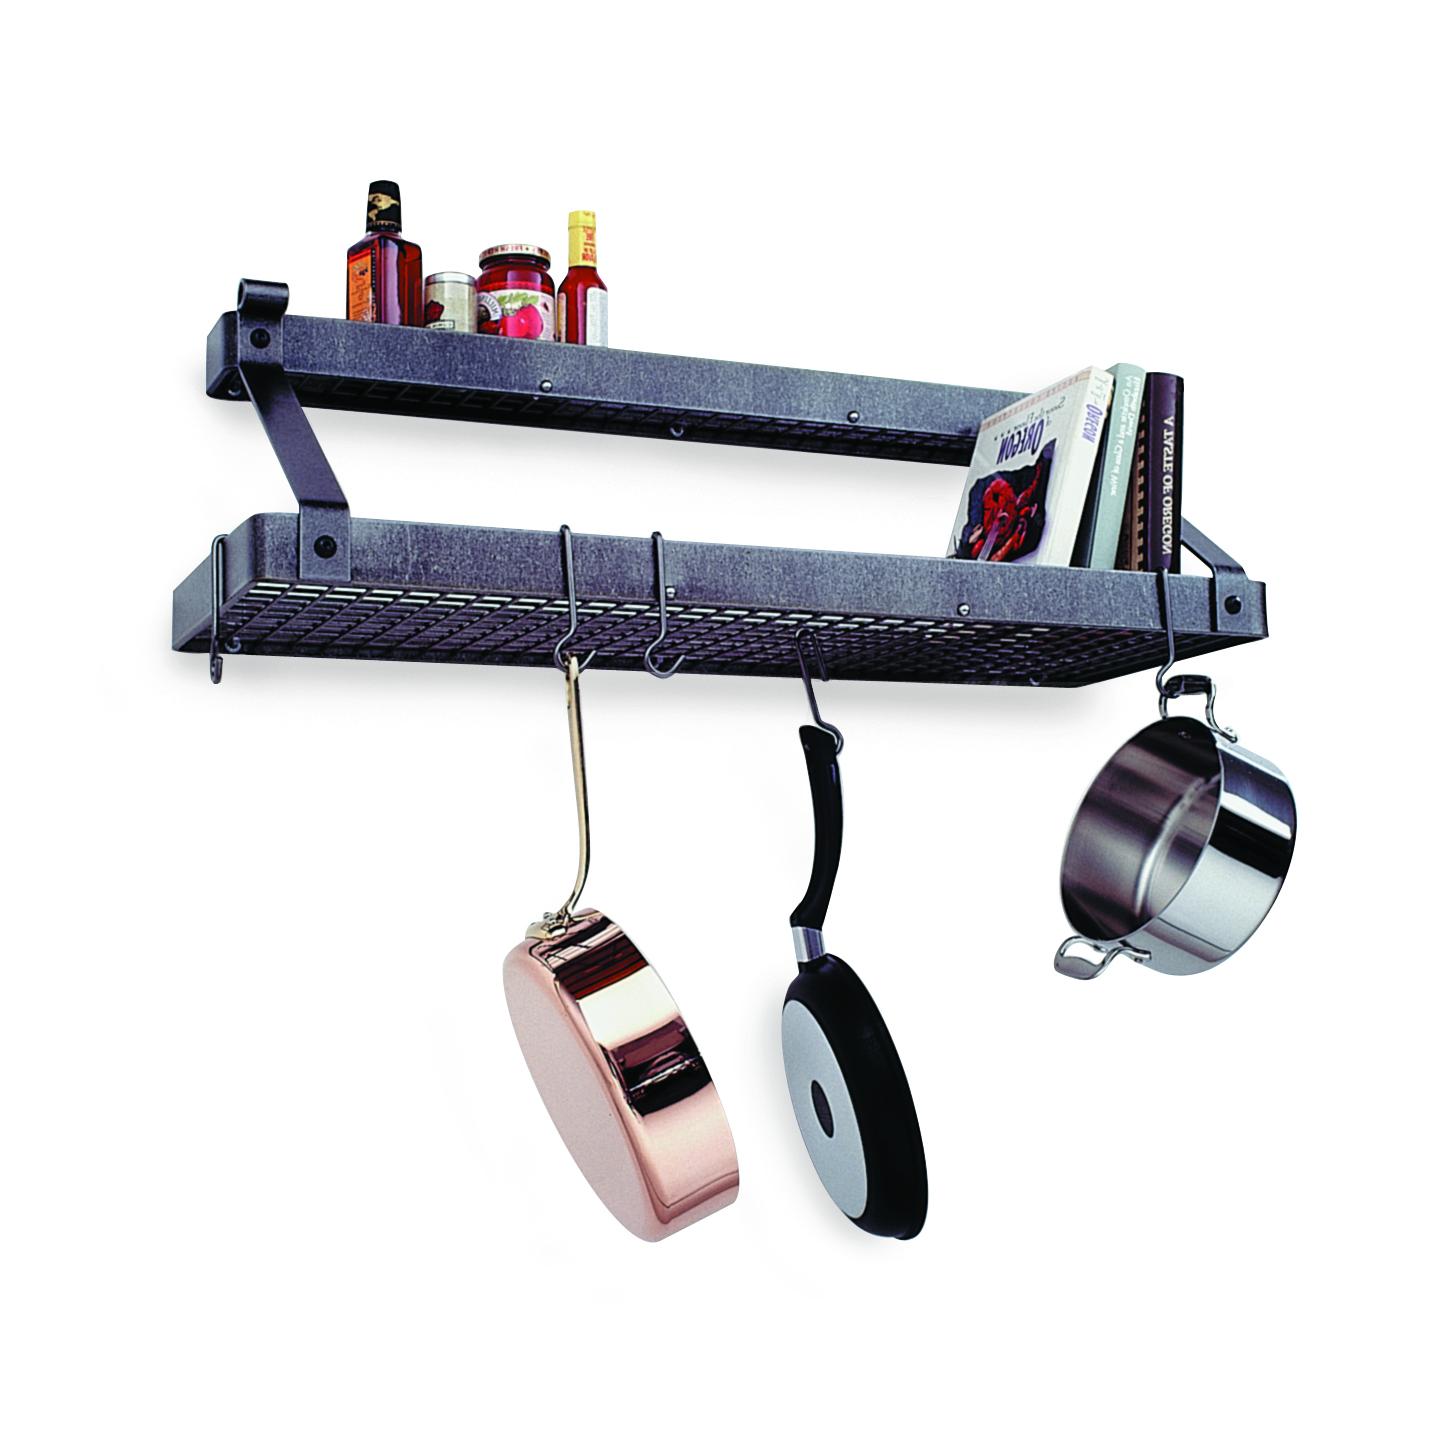 Enclume Hammered Steel Bookshelf 2 Shelf Pot Rack